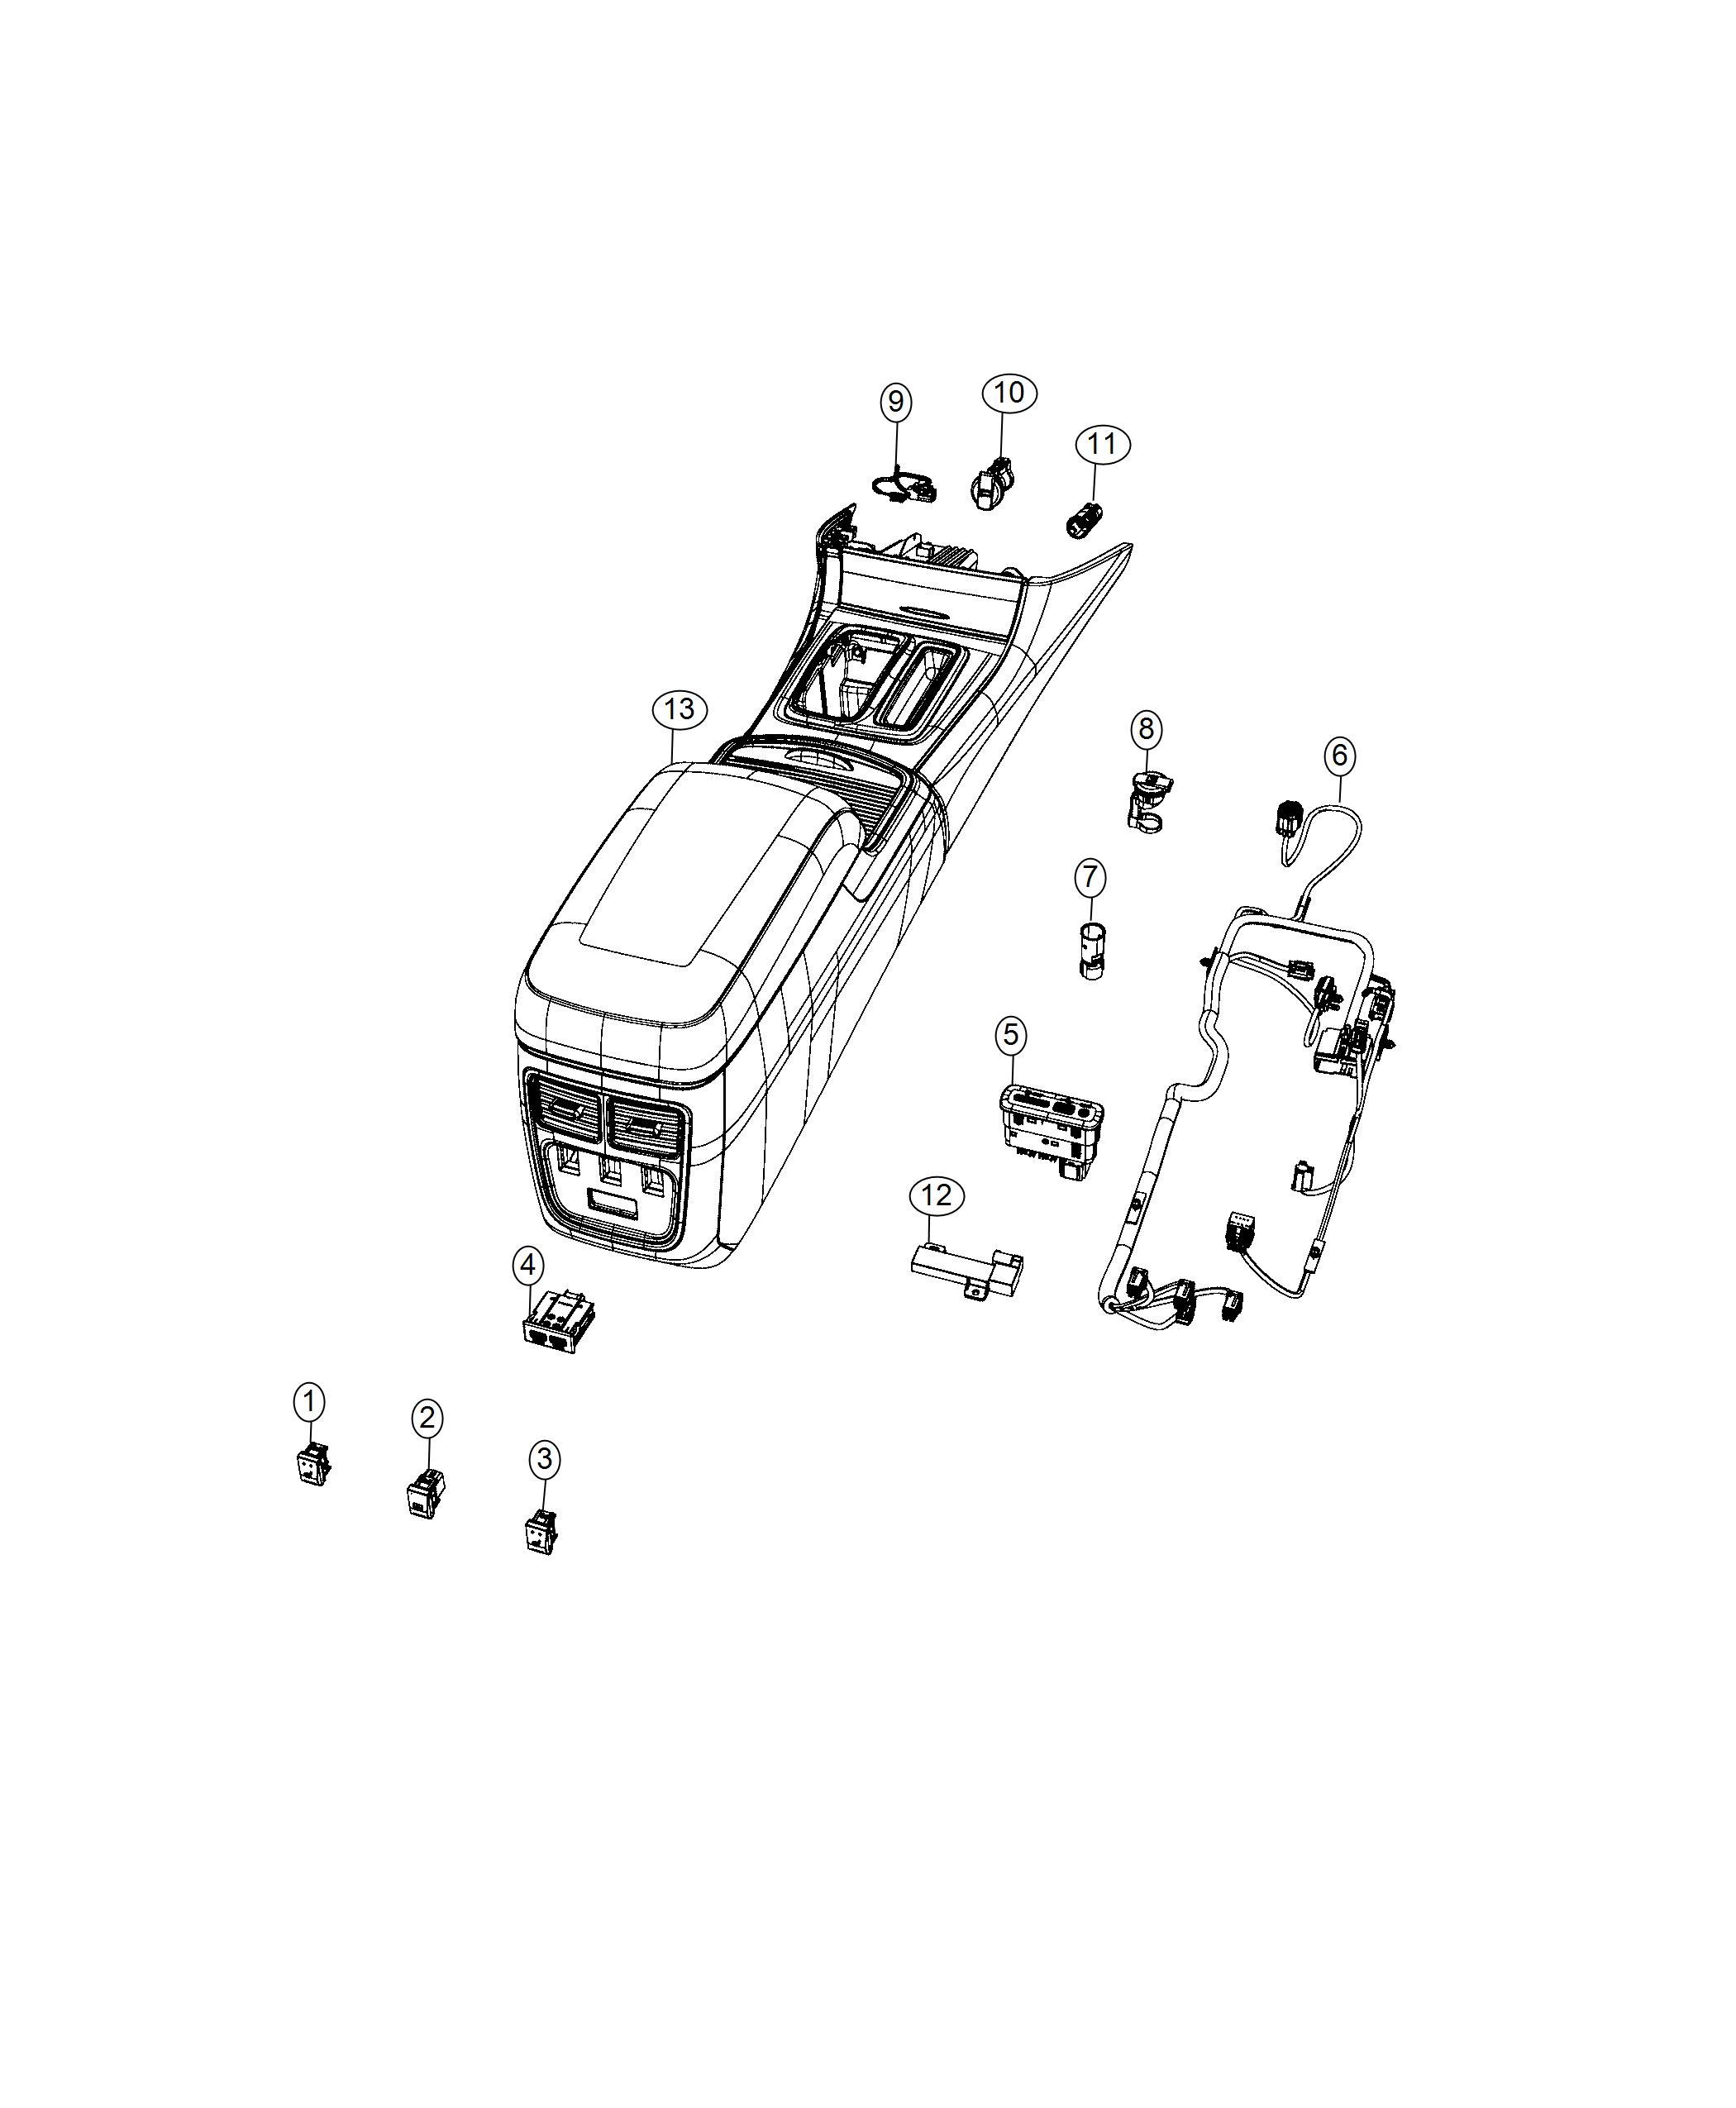 Chrysler 300 Wiring Console Trim No Description